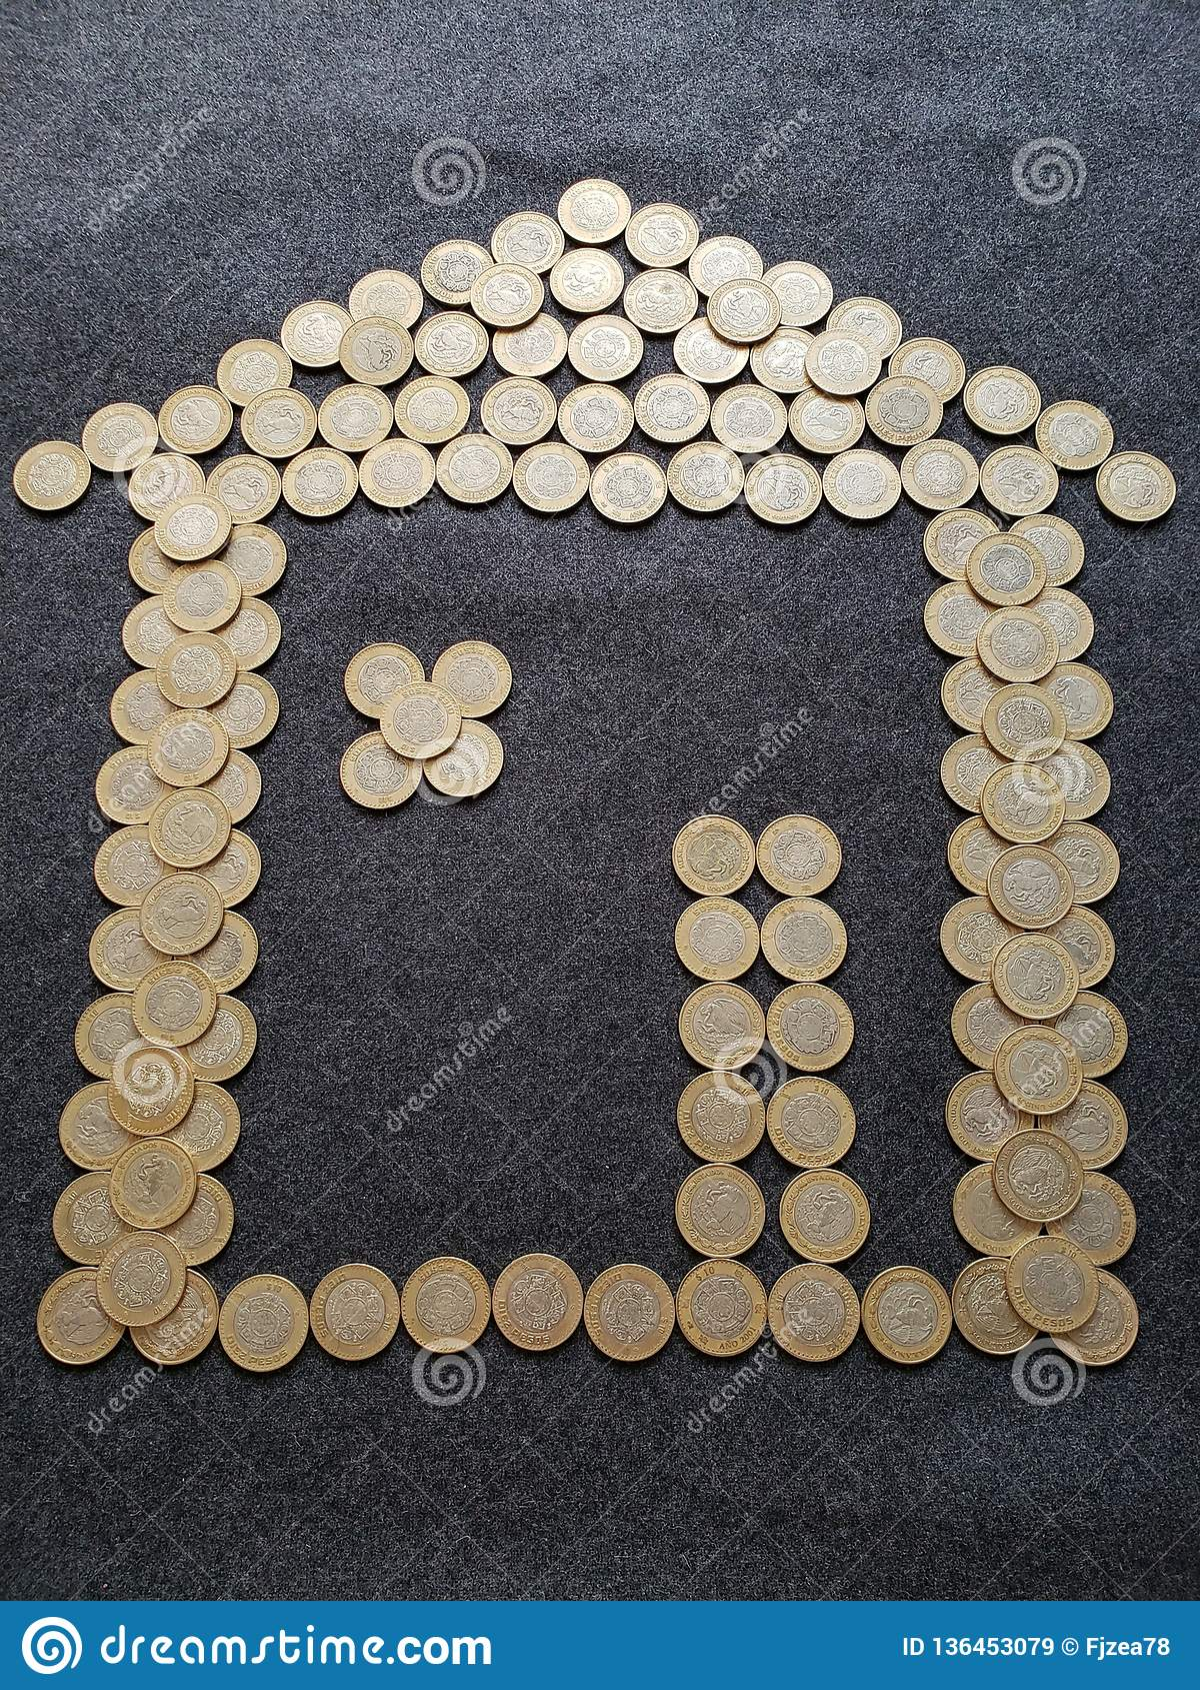 Mexican Coins Of Ten Pesos Forming A House Figure Stock